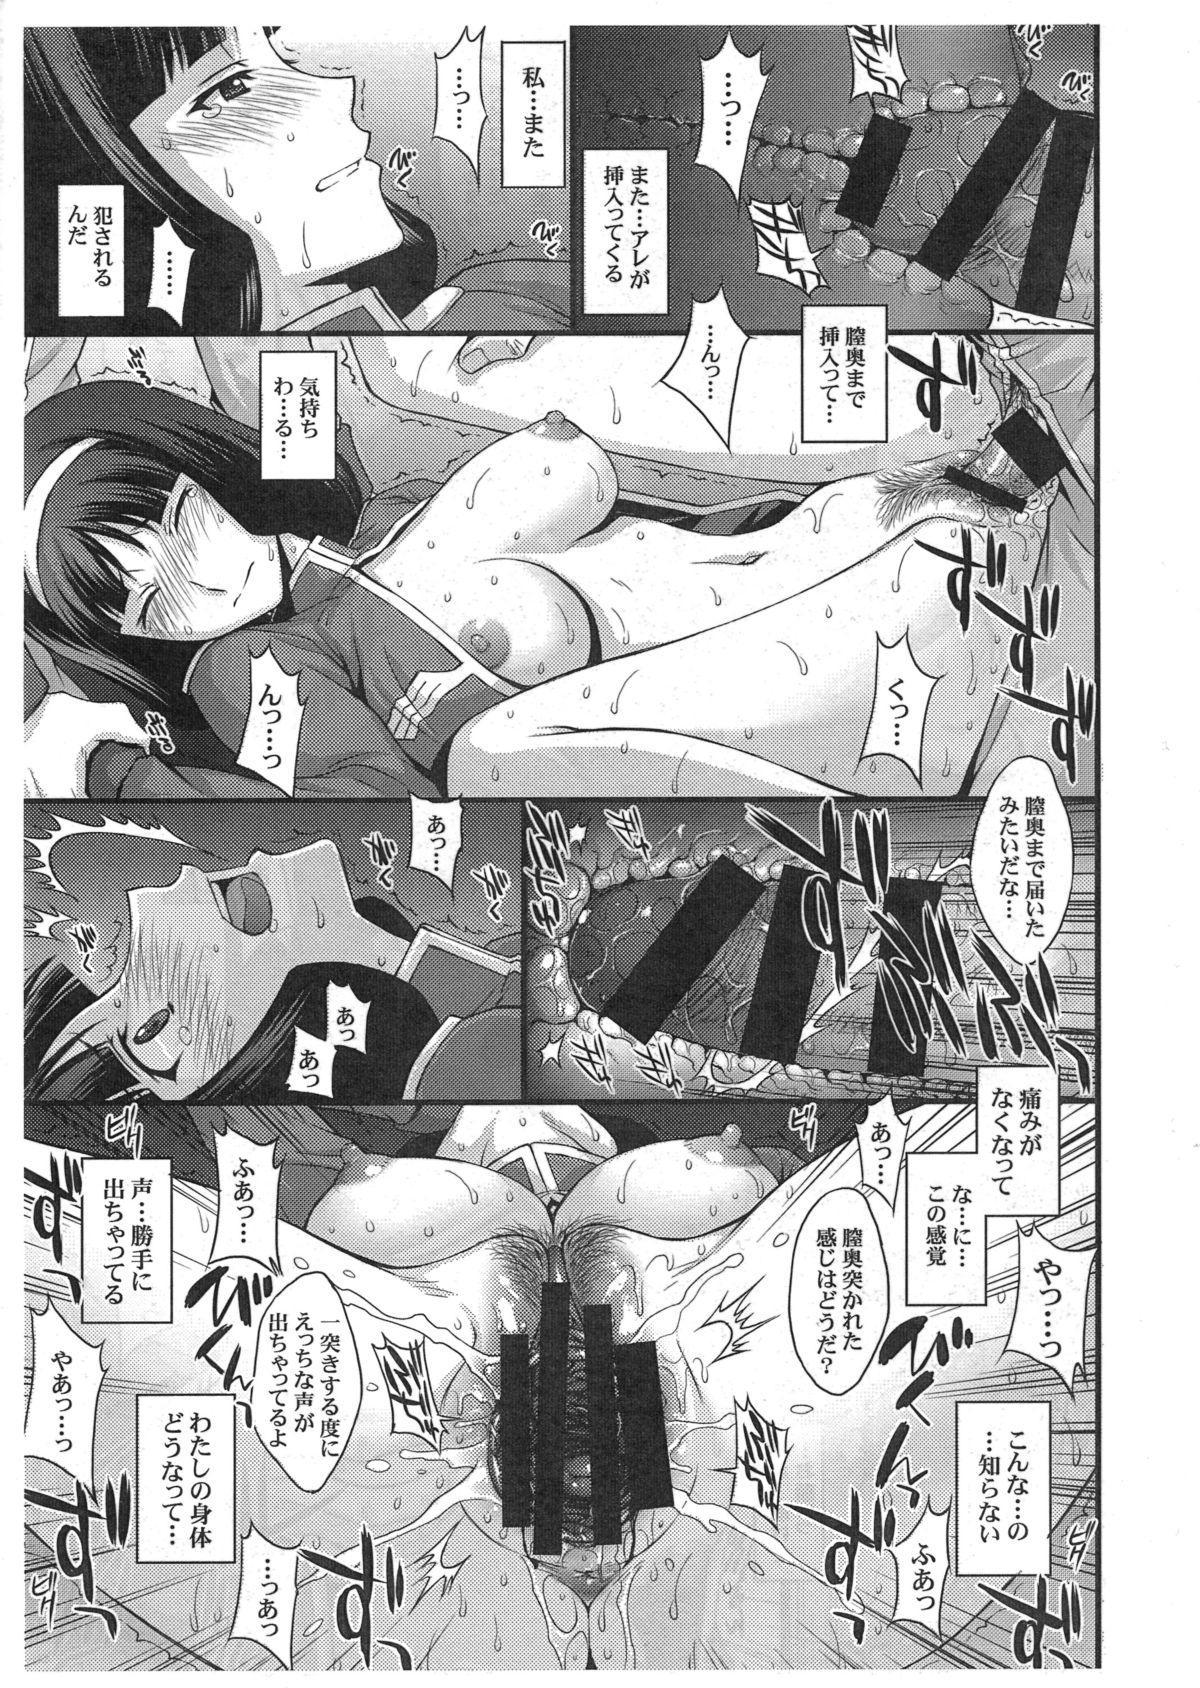 ZEON Lost War Chronicles - Gaiden no Daigyakushuu 8